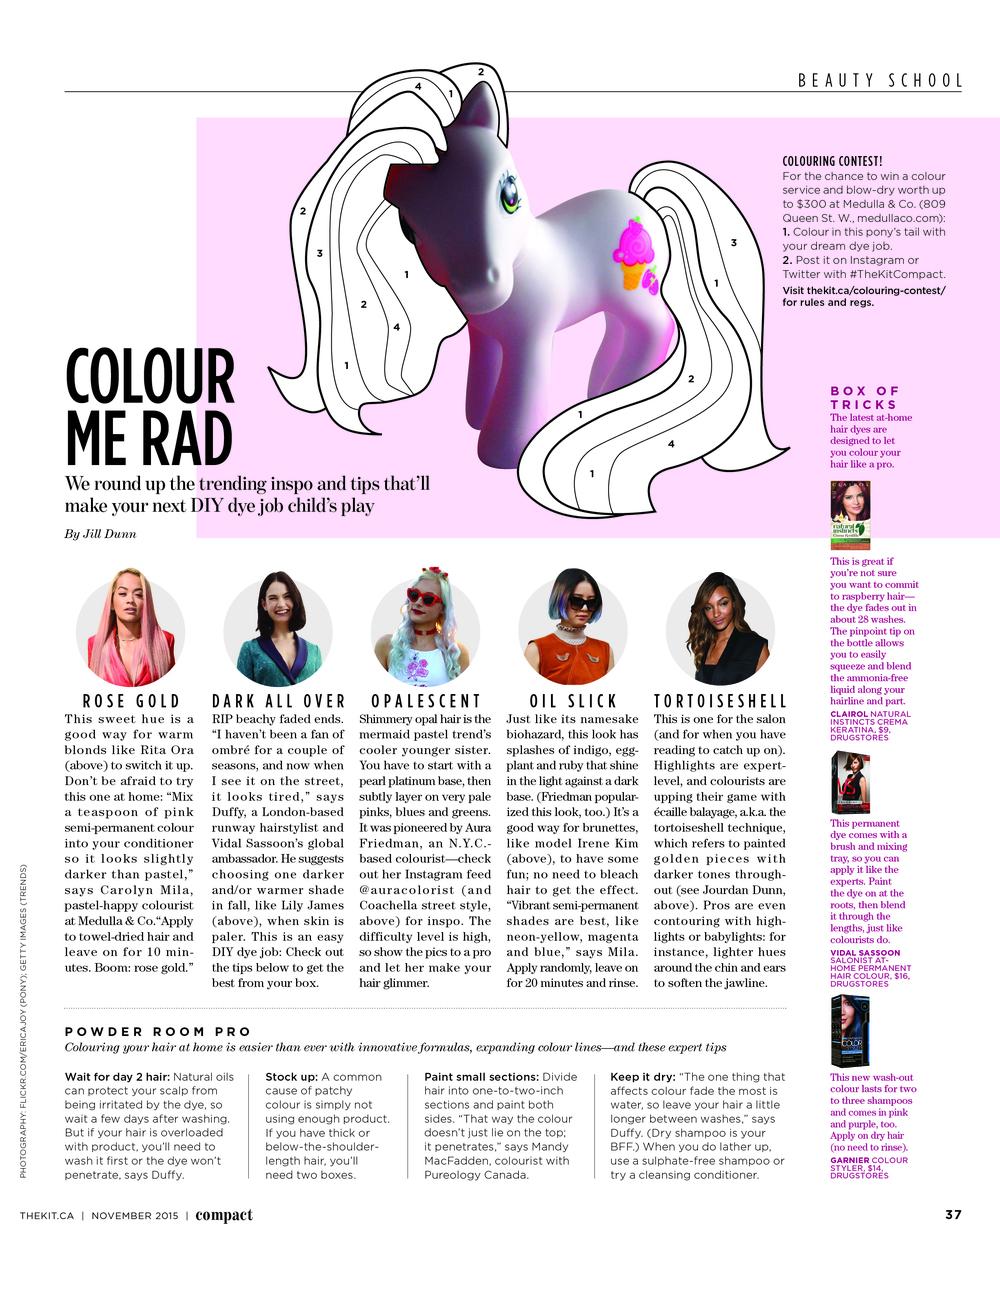 ColourMeRad.jpg